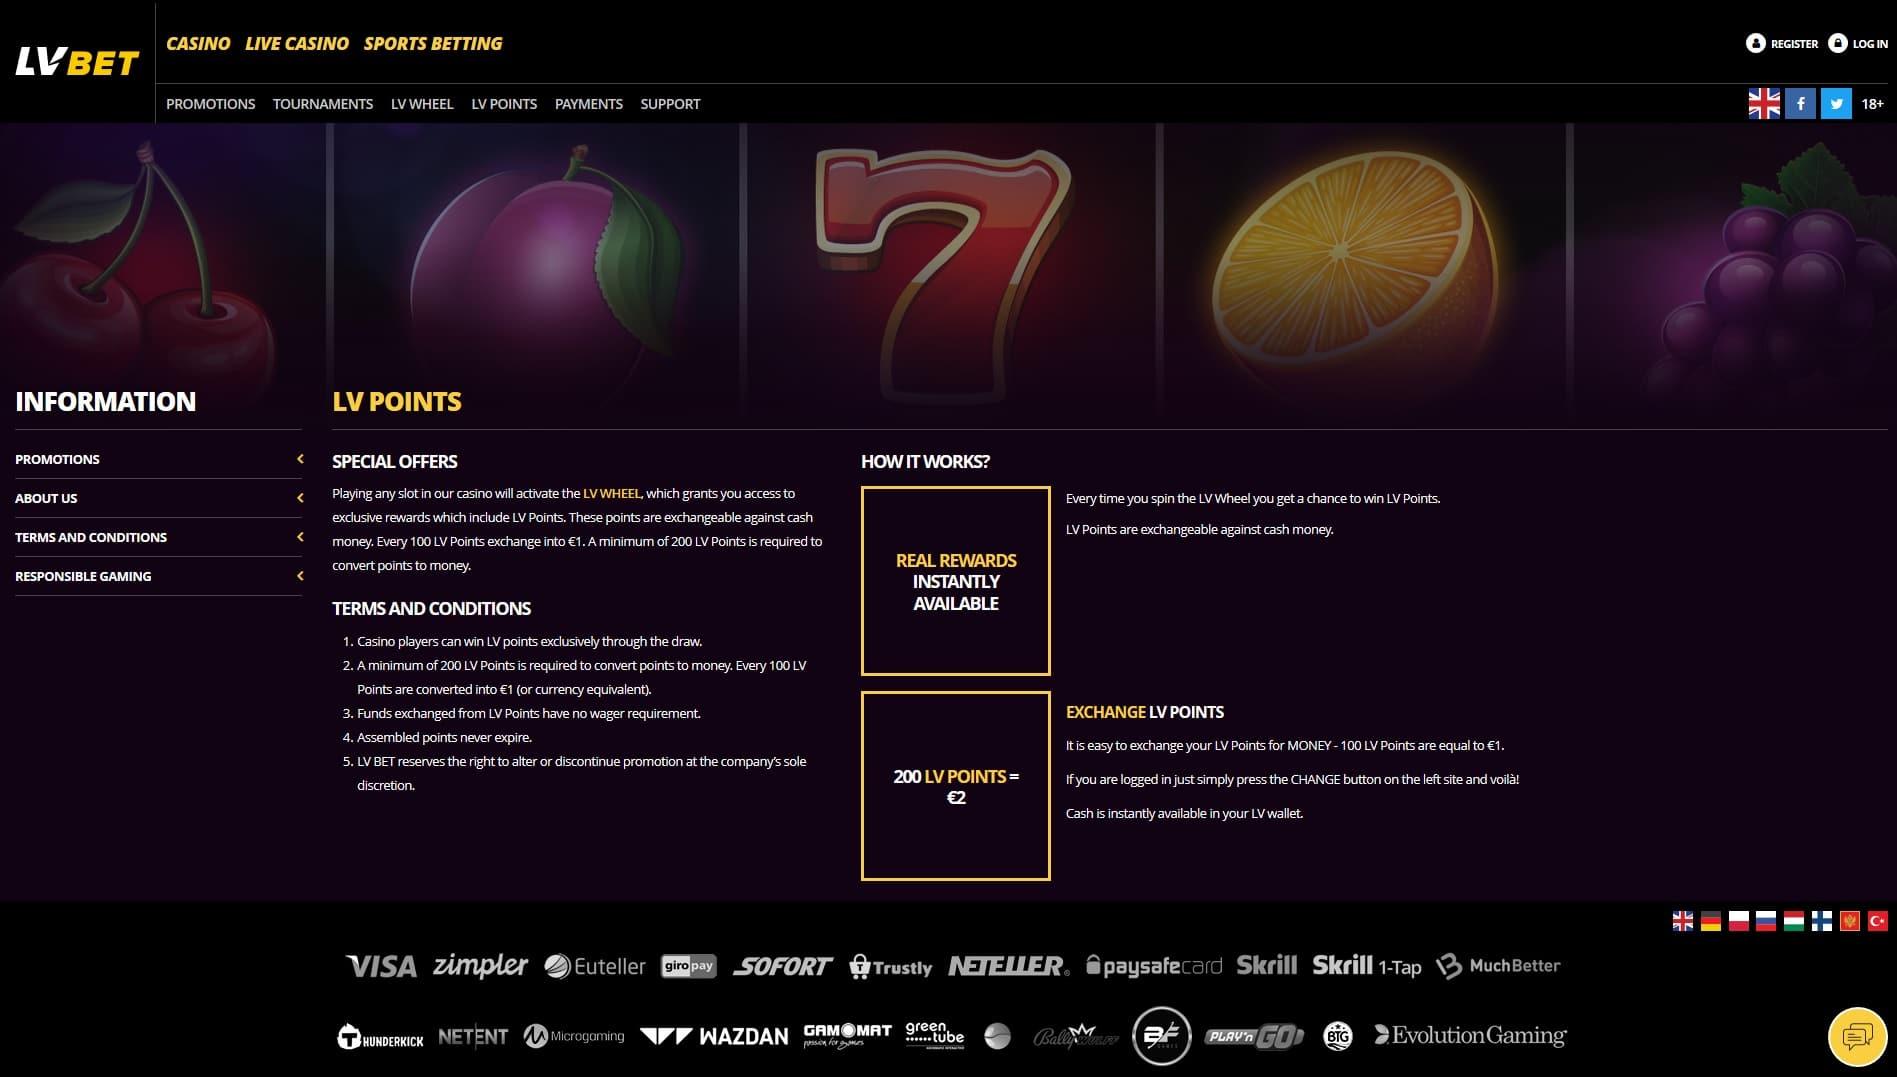 LVBet Review - 5€ No Deposit Bonus + 1000€ Casino Bonus (2019)